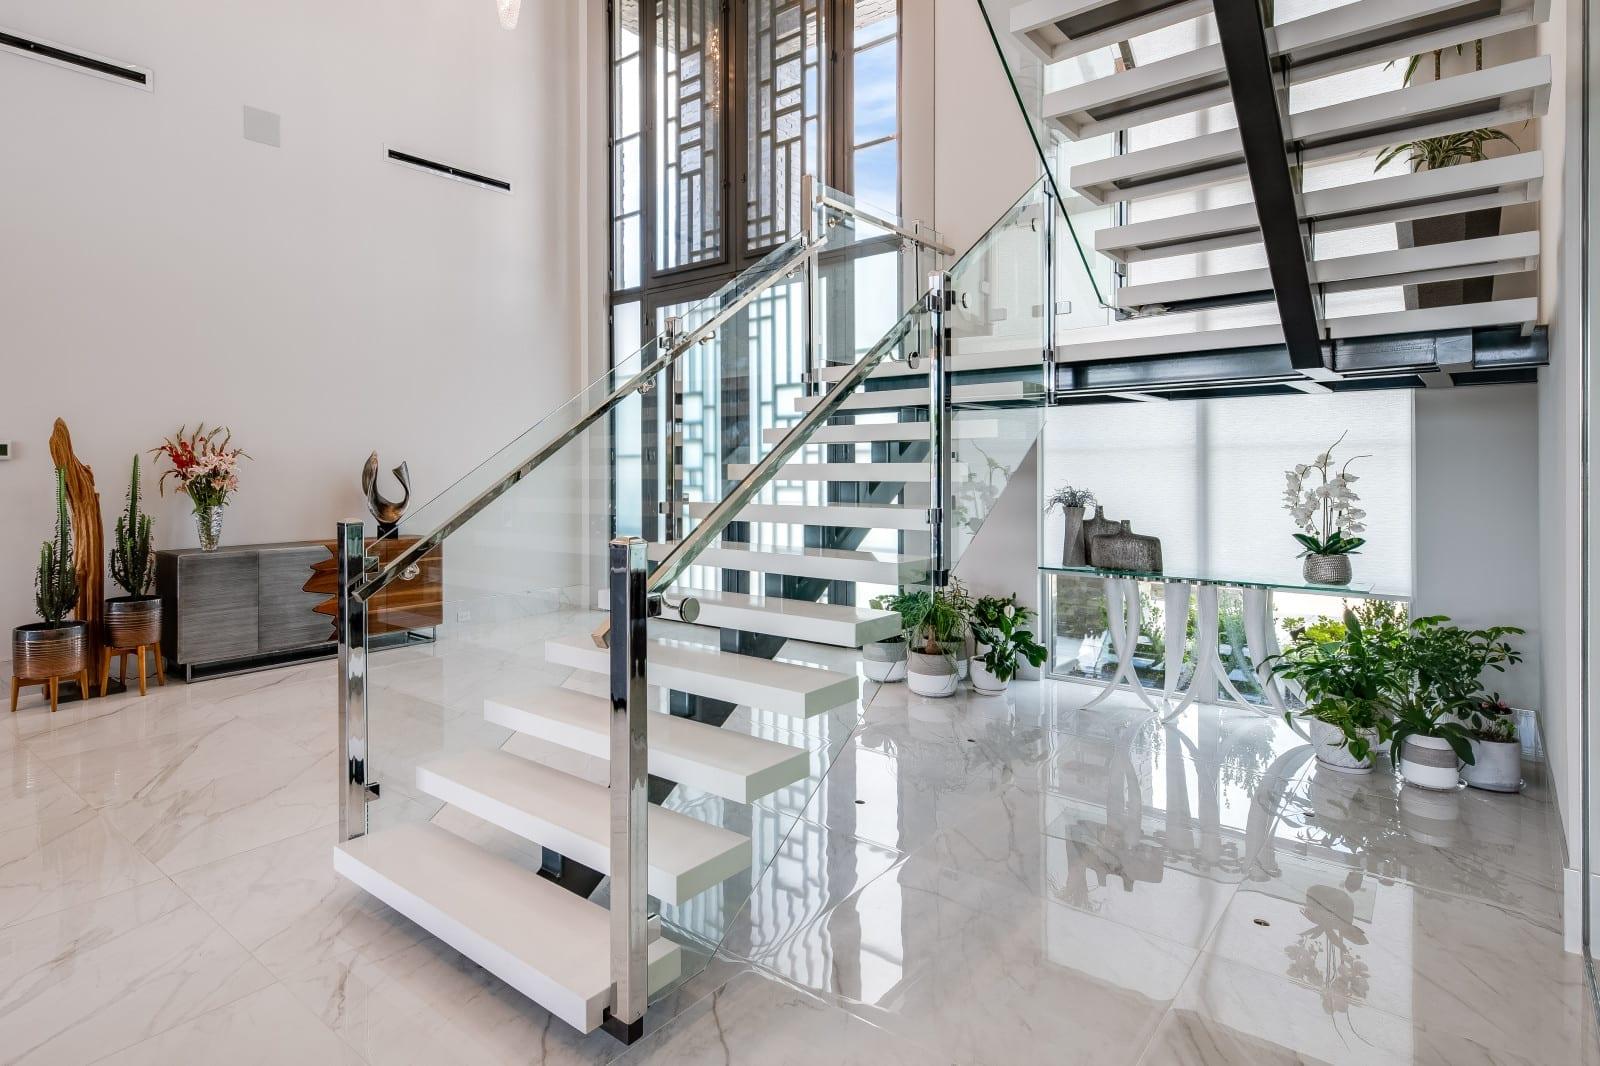 Custom Home Build and Interior Design # 3 - Millennial Design + Build, Custom Home Builders in Dallas Texas, modern style homes, Property Evaluator, Interior Designers, using BIM Technology and Home 3D Model.